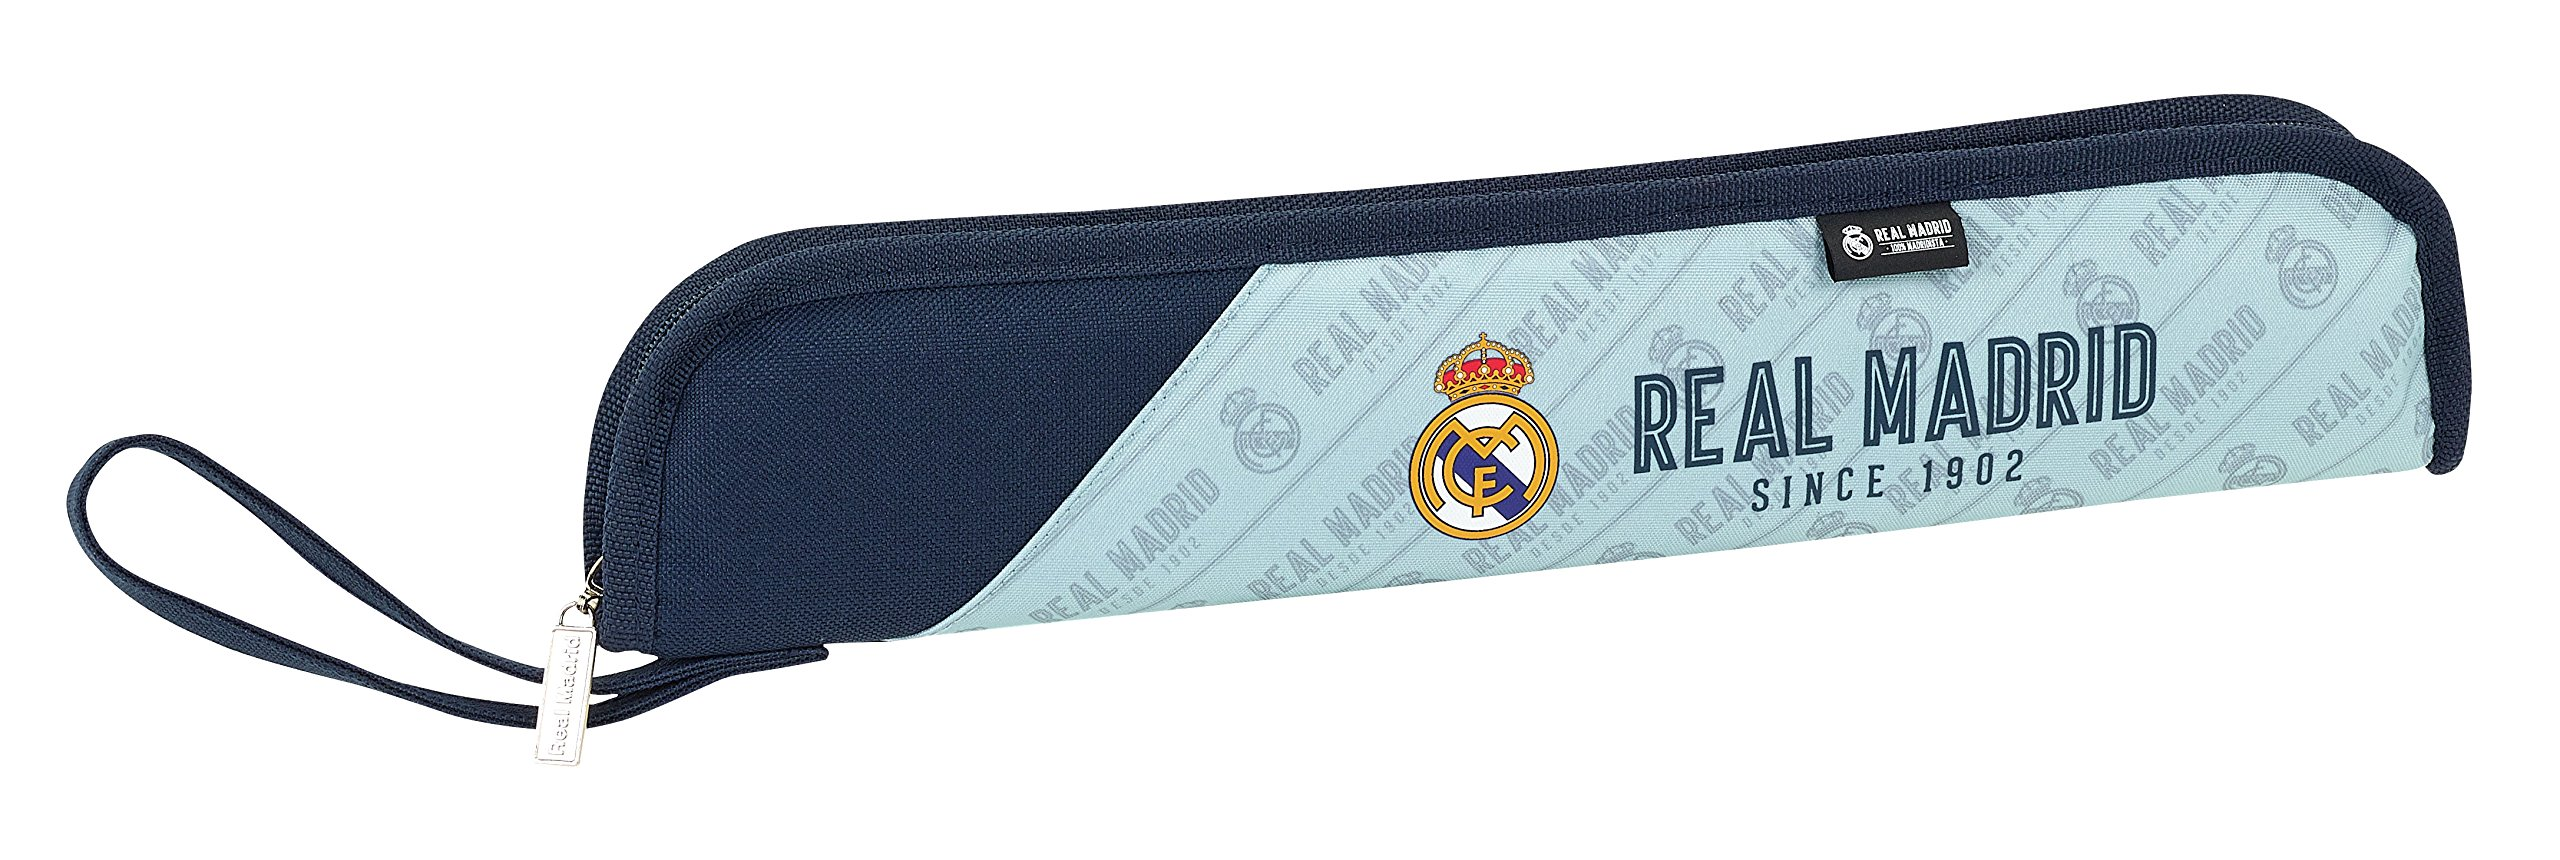 Real Madrid SAFTA Portaflautas Corporativa Oficial Protector Flauta 370x20x80mm